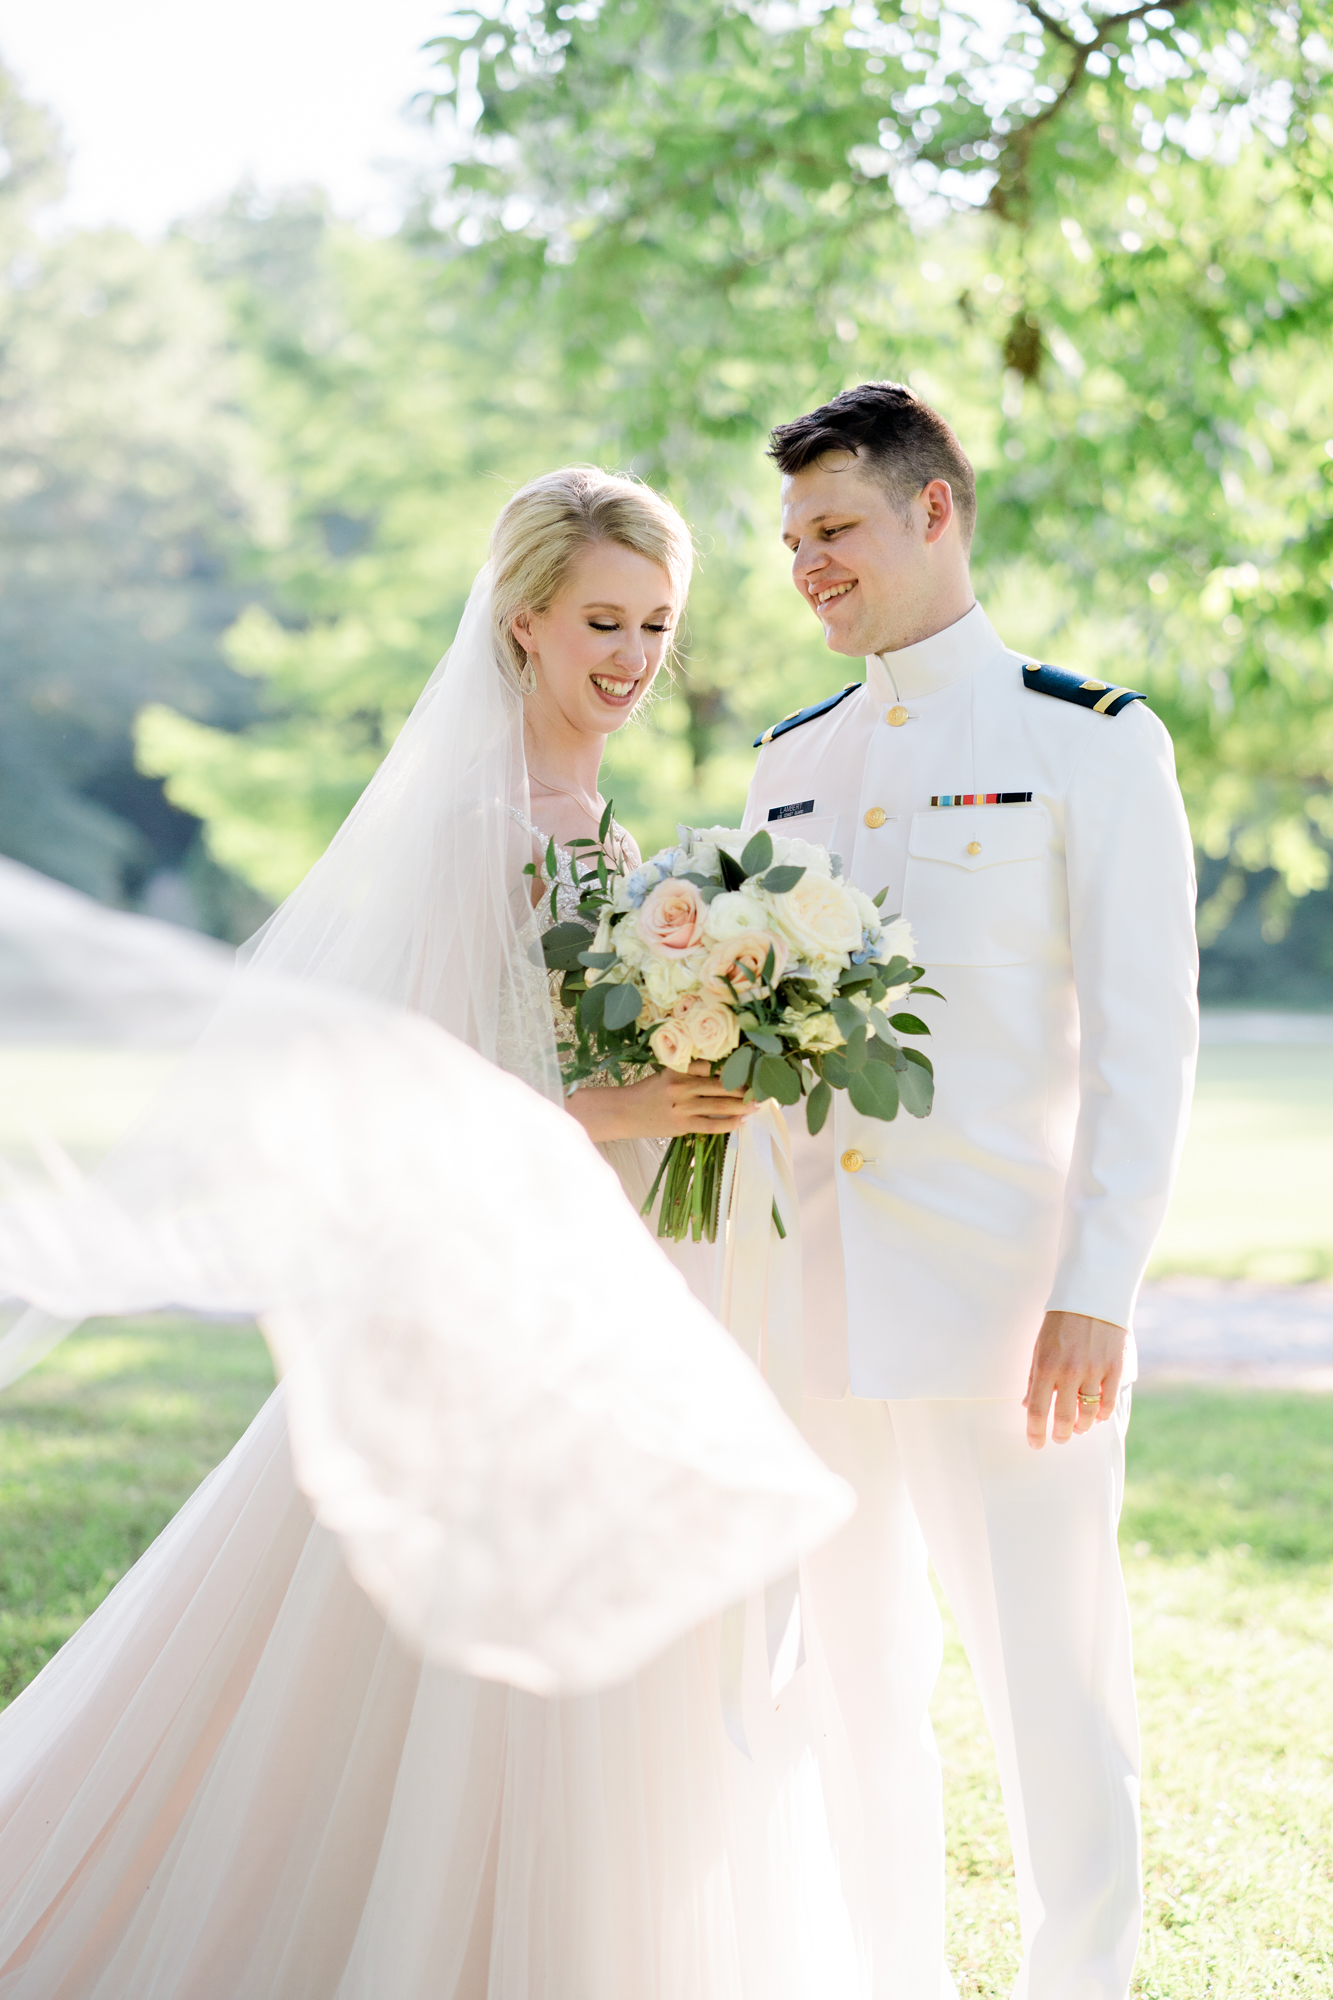 Alabama-Photographers-Nick-Drollette-Wedding-Photography-146.jpg